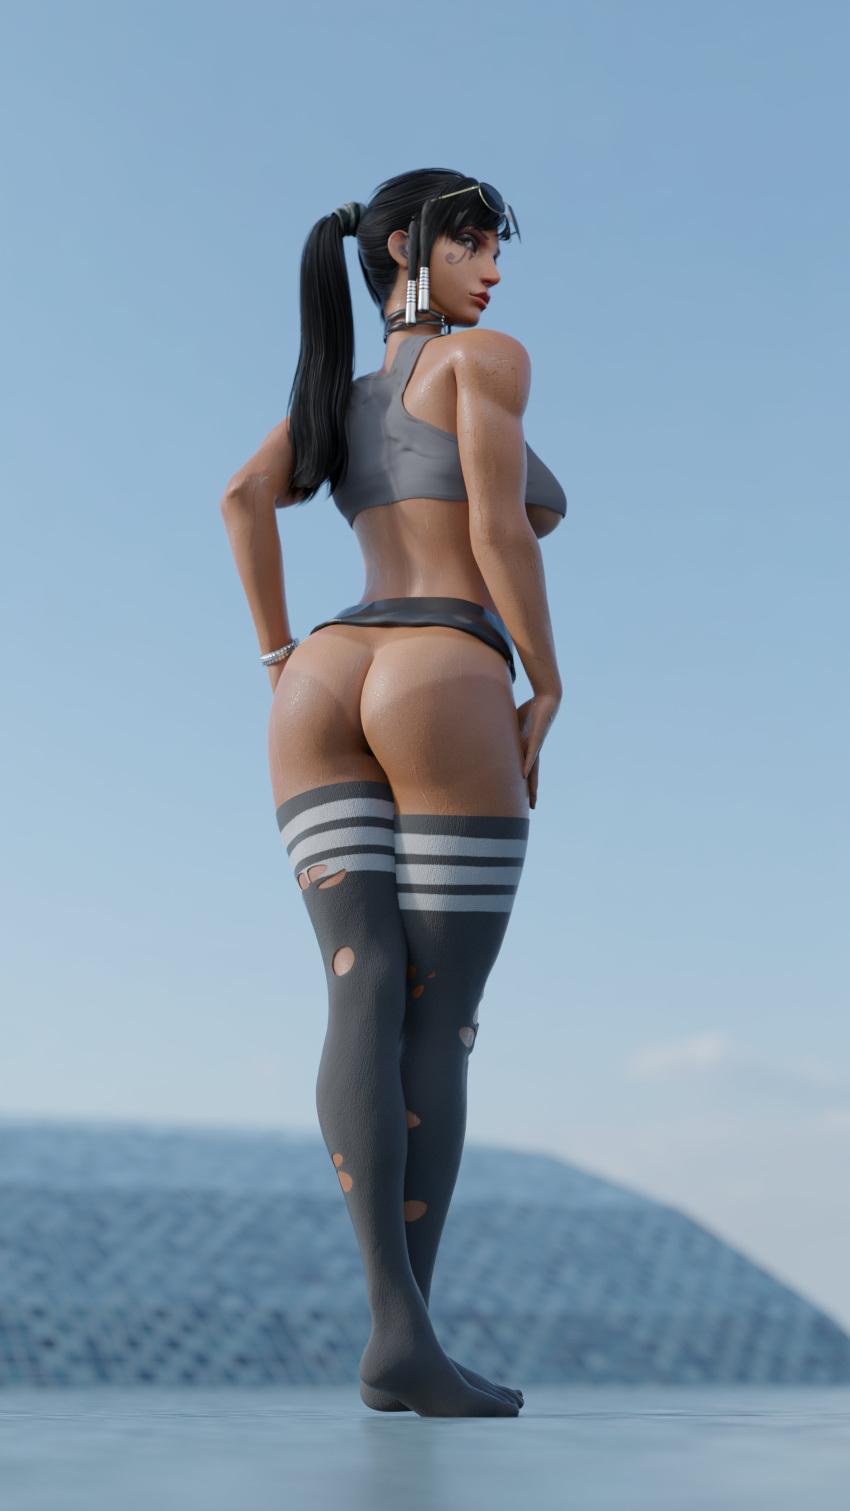 overwatch-free-sex-art-–-dark-skin,-black-hair,-dark-skinned-female,-female,-presenting,-thick-thighs.